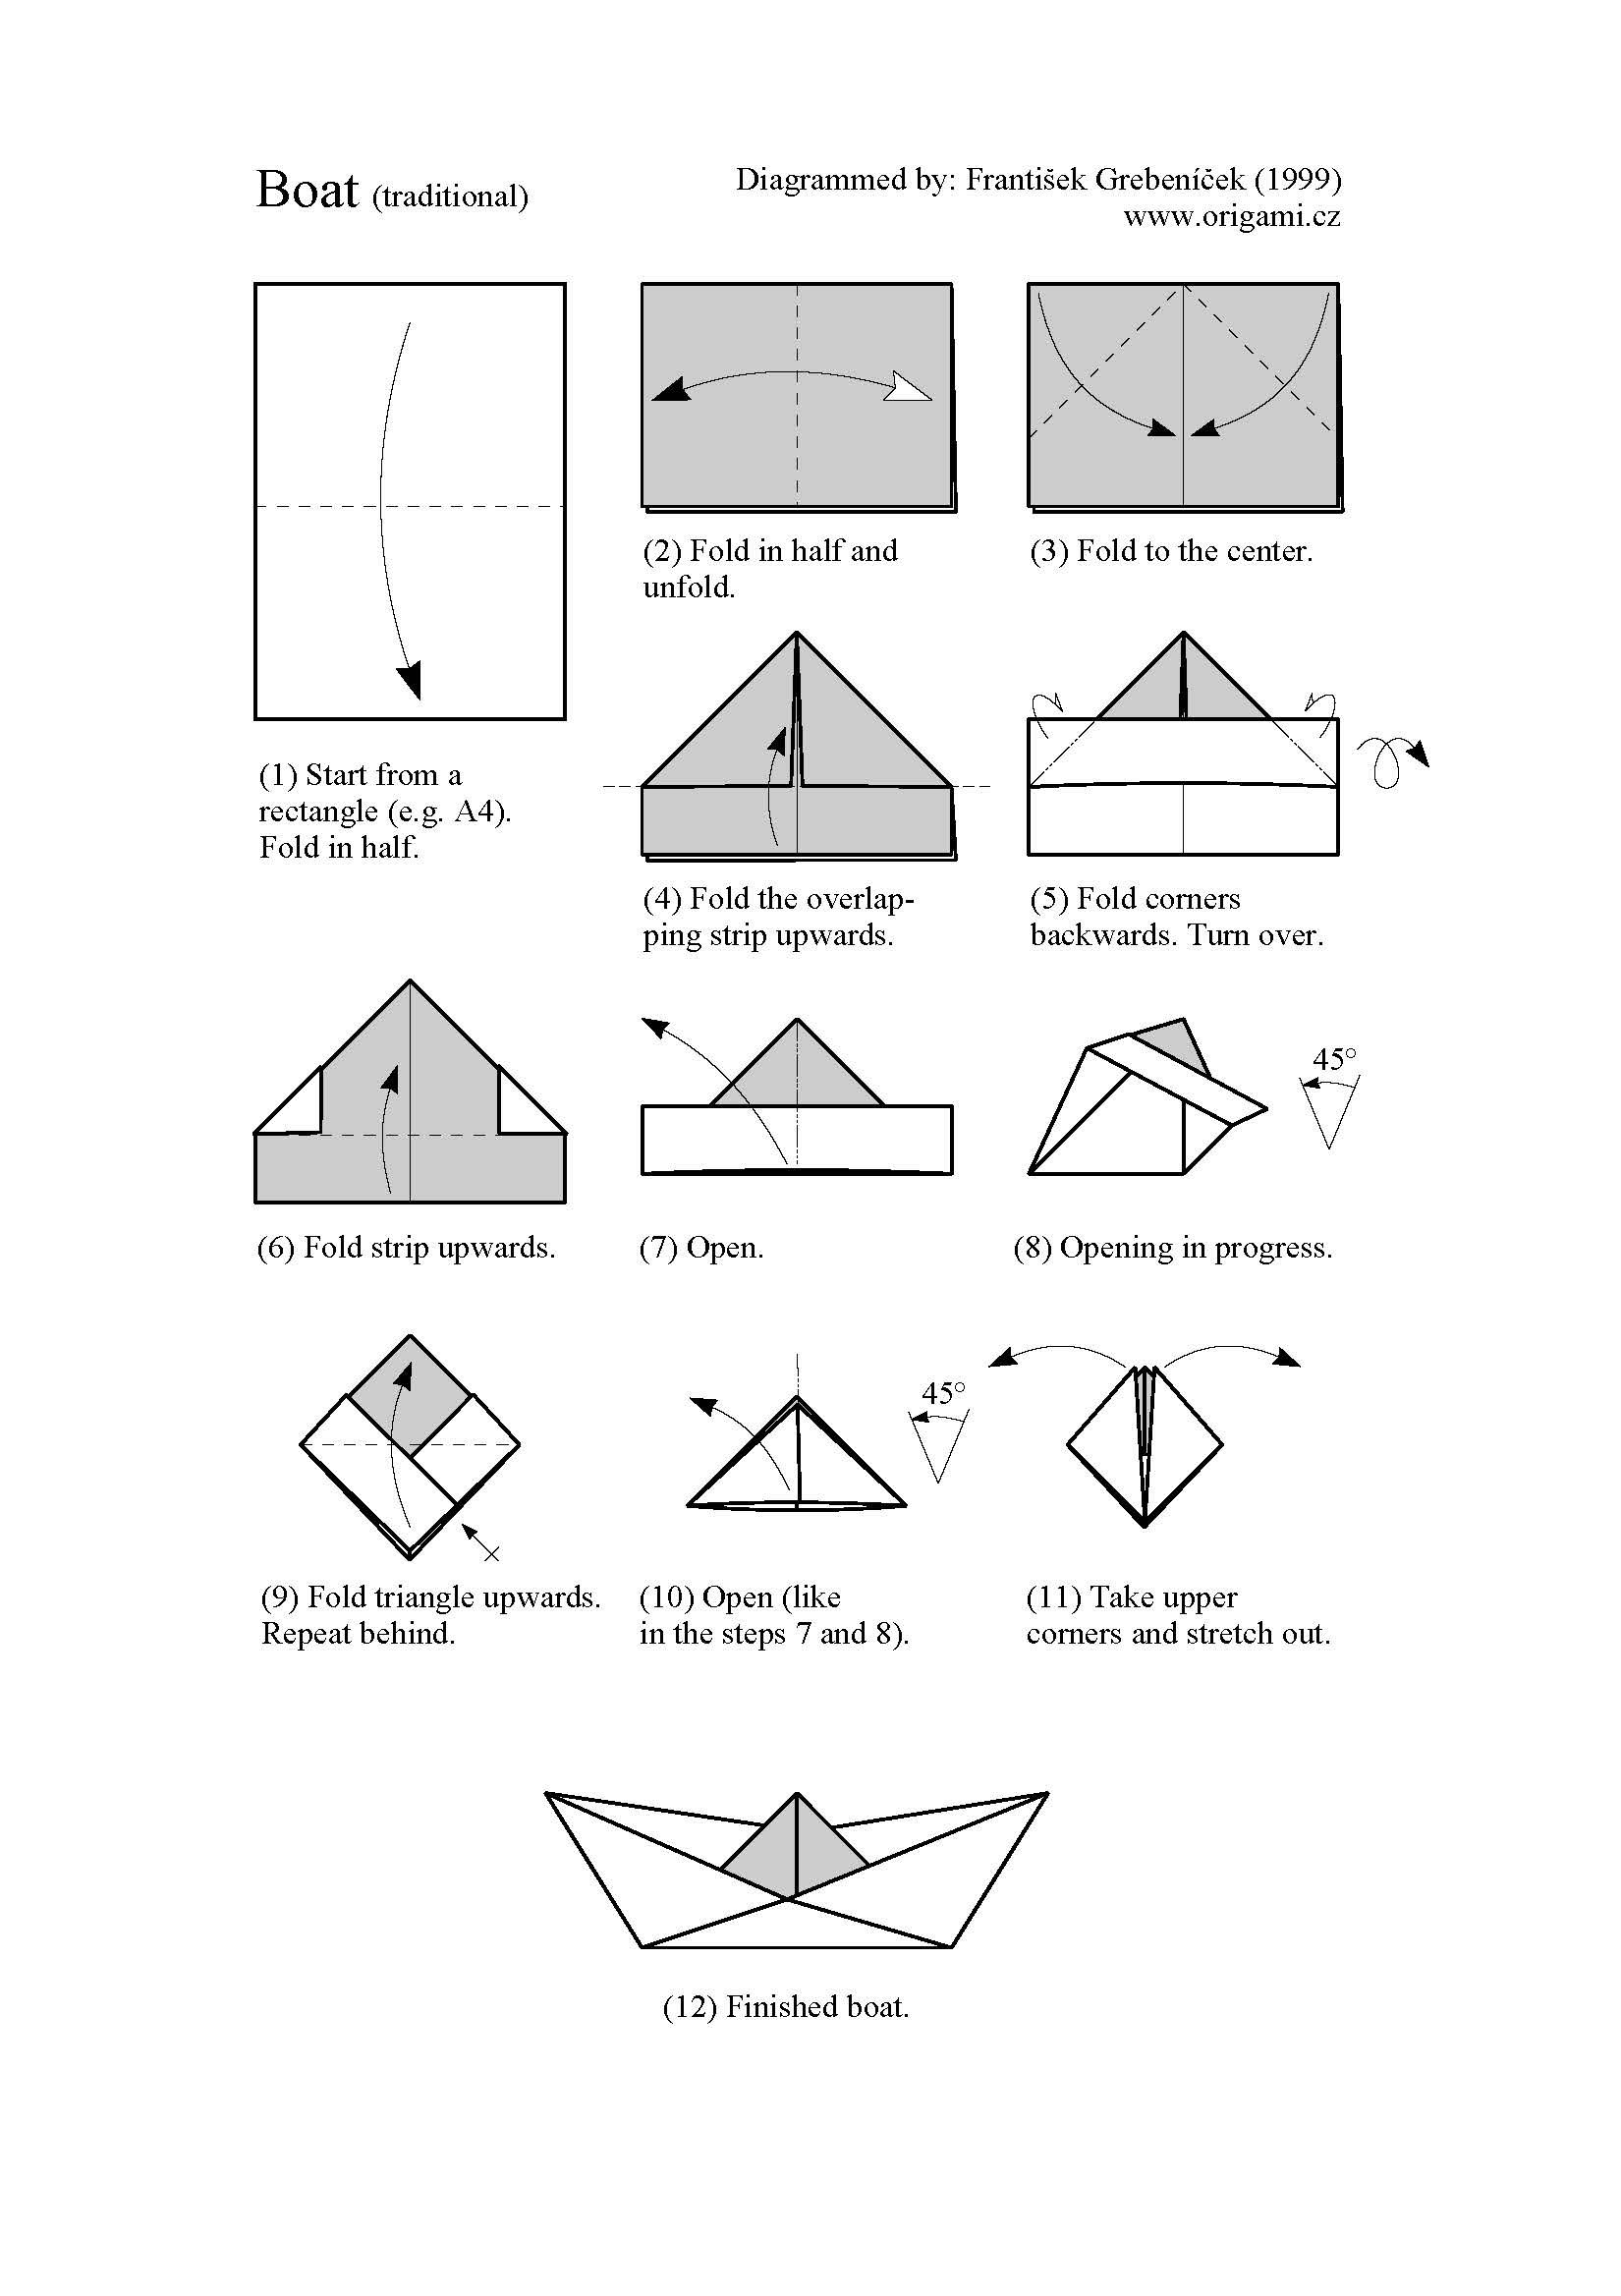 enorigami.com | Make a paper boat. Origami boat instructions. Origami boat